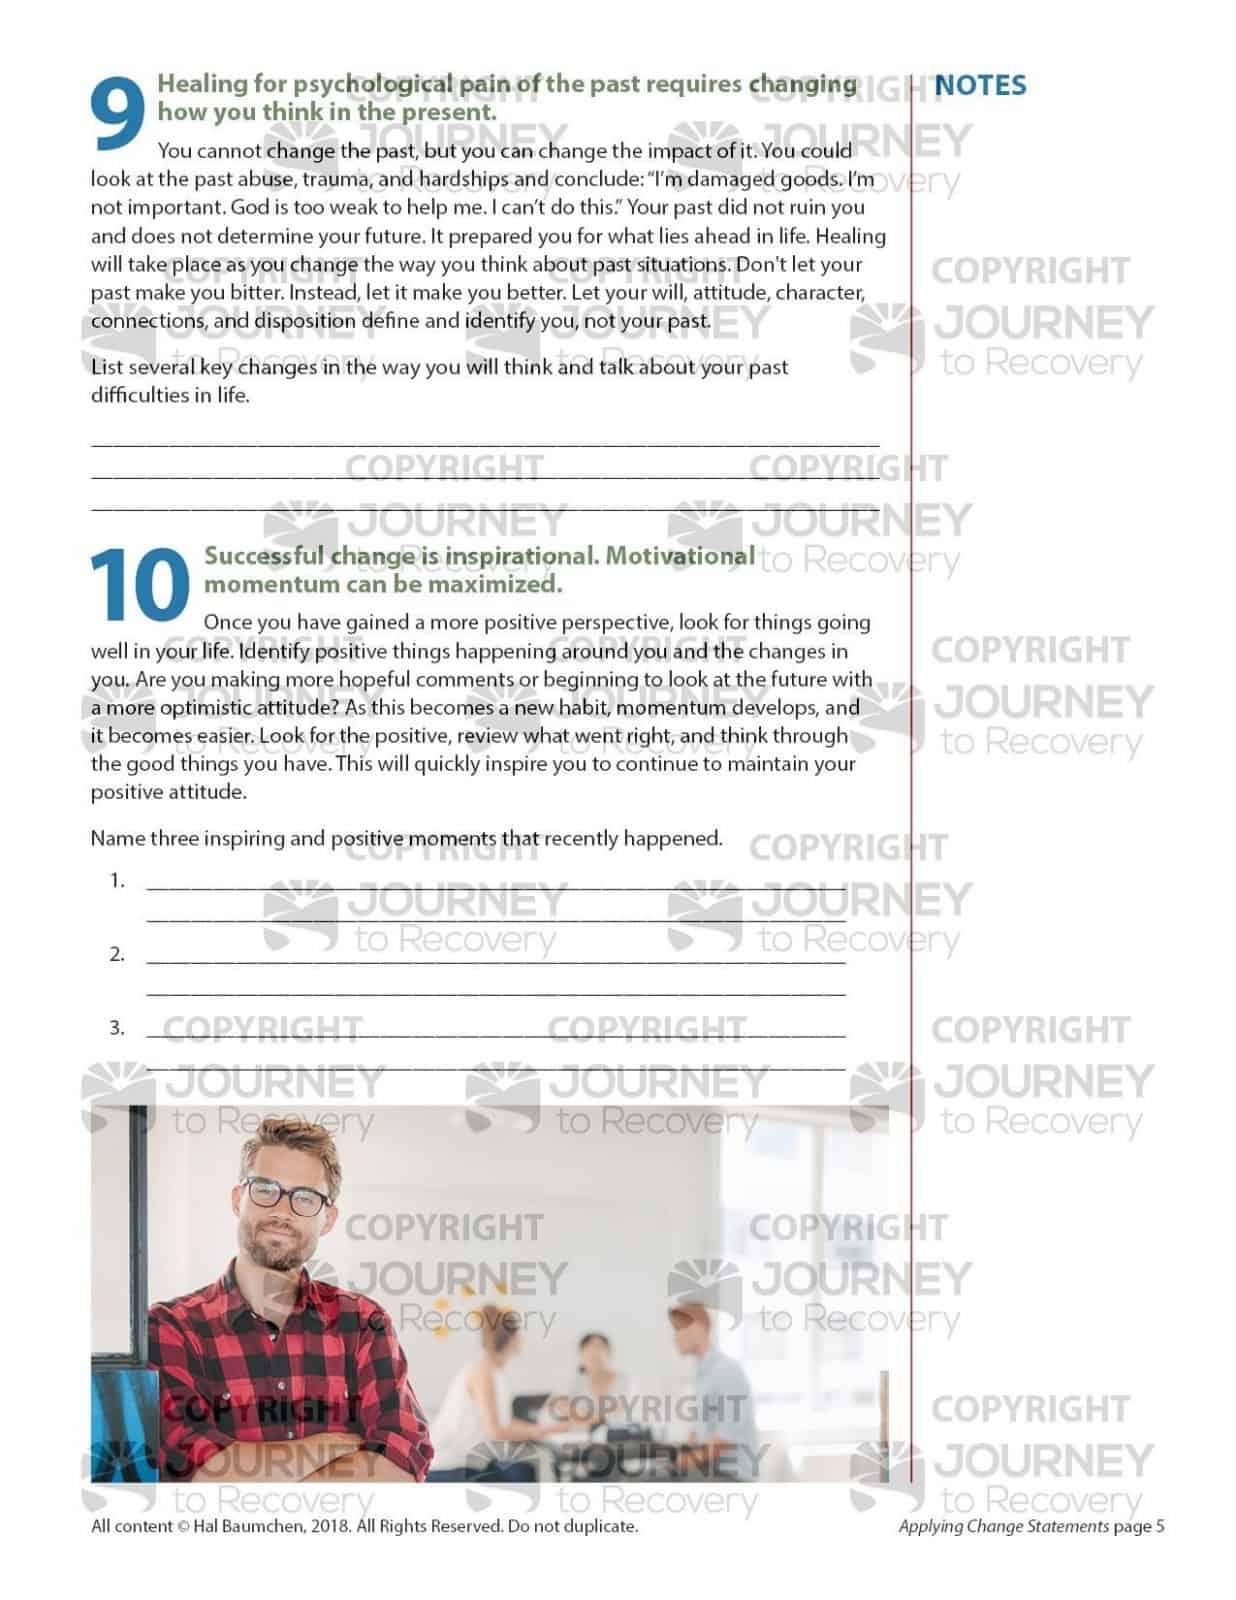 Applying Change Statements Lesson17